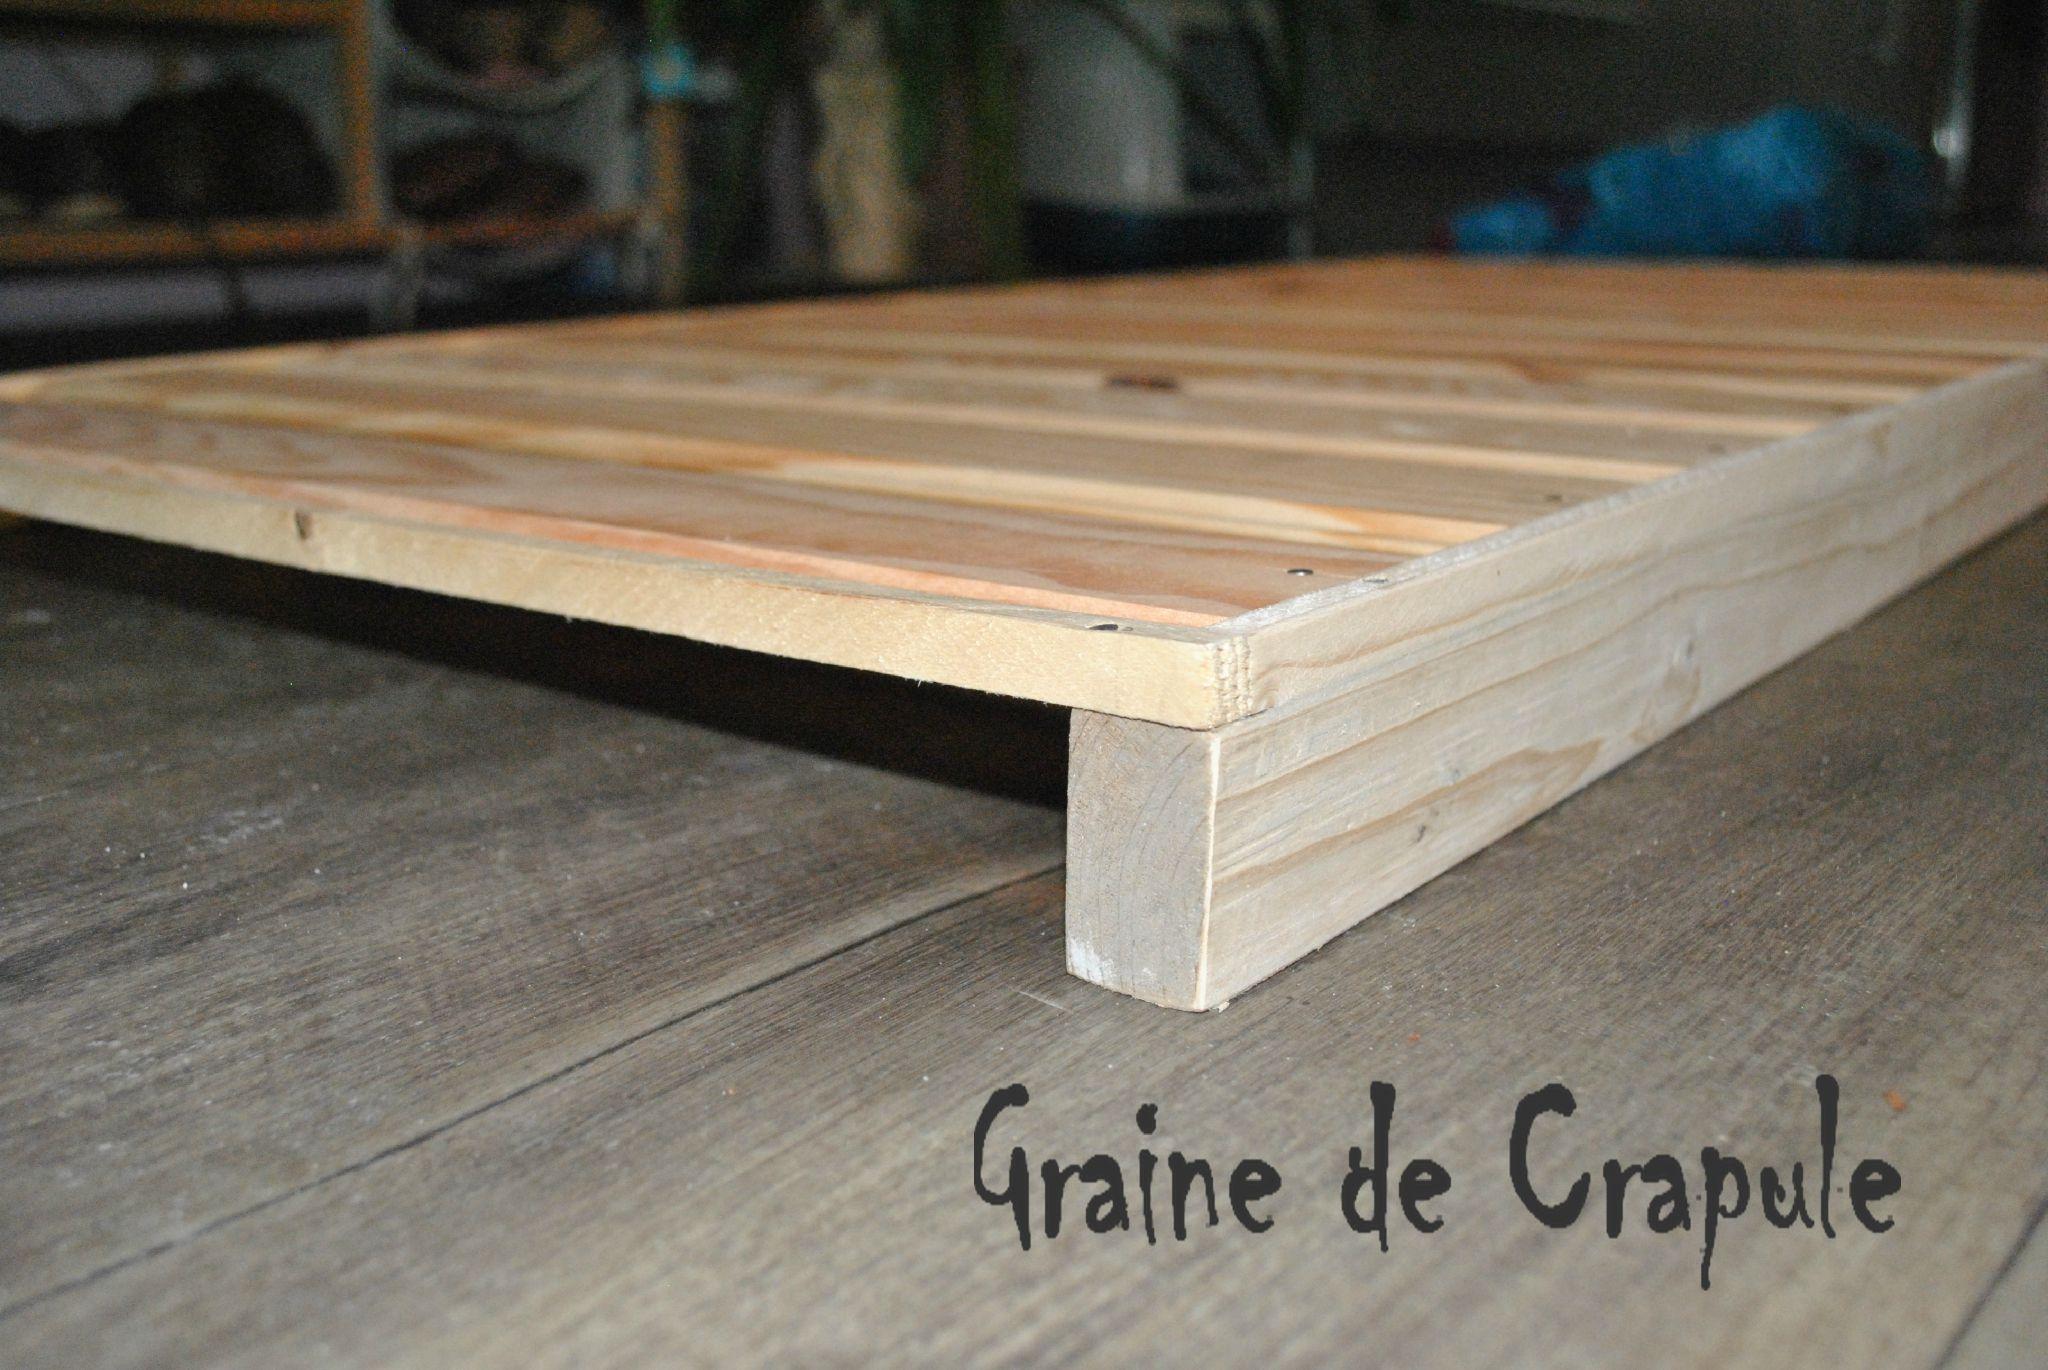 lit au sol version montessori graine de crapule baby floor bed floor bed frame - Sommier Lit